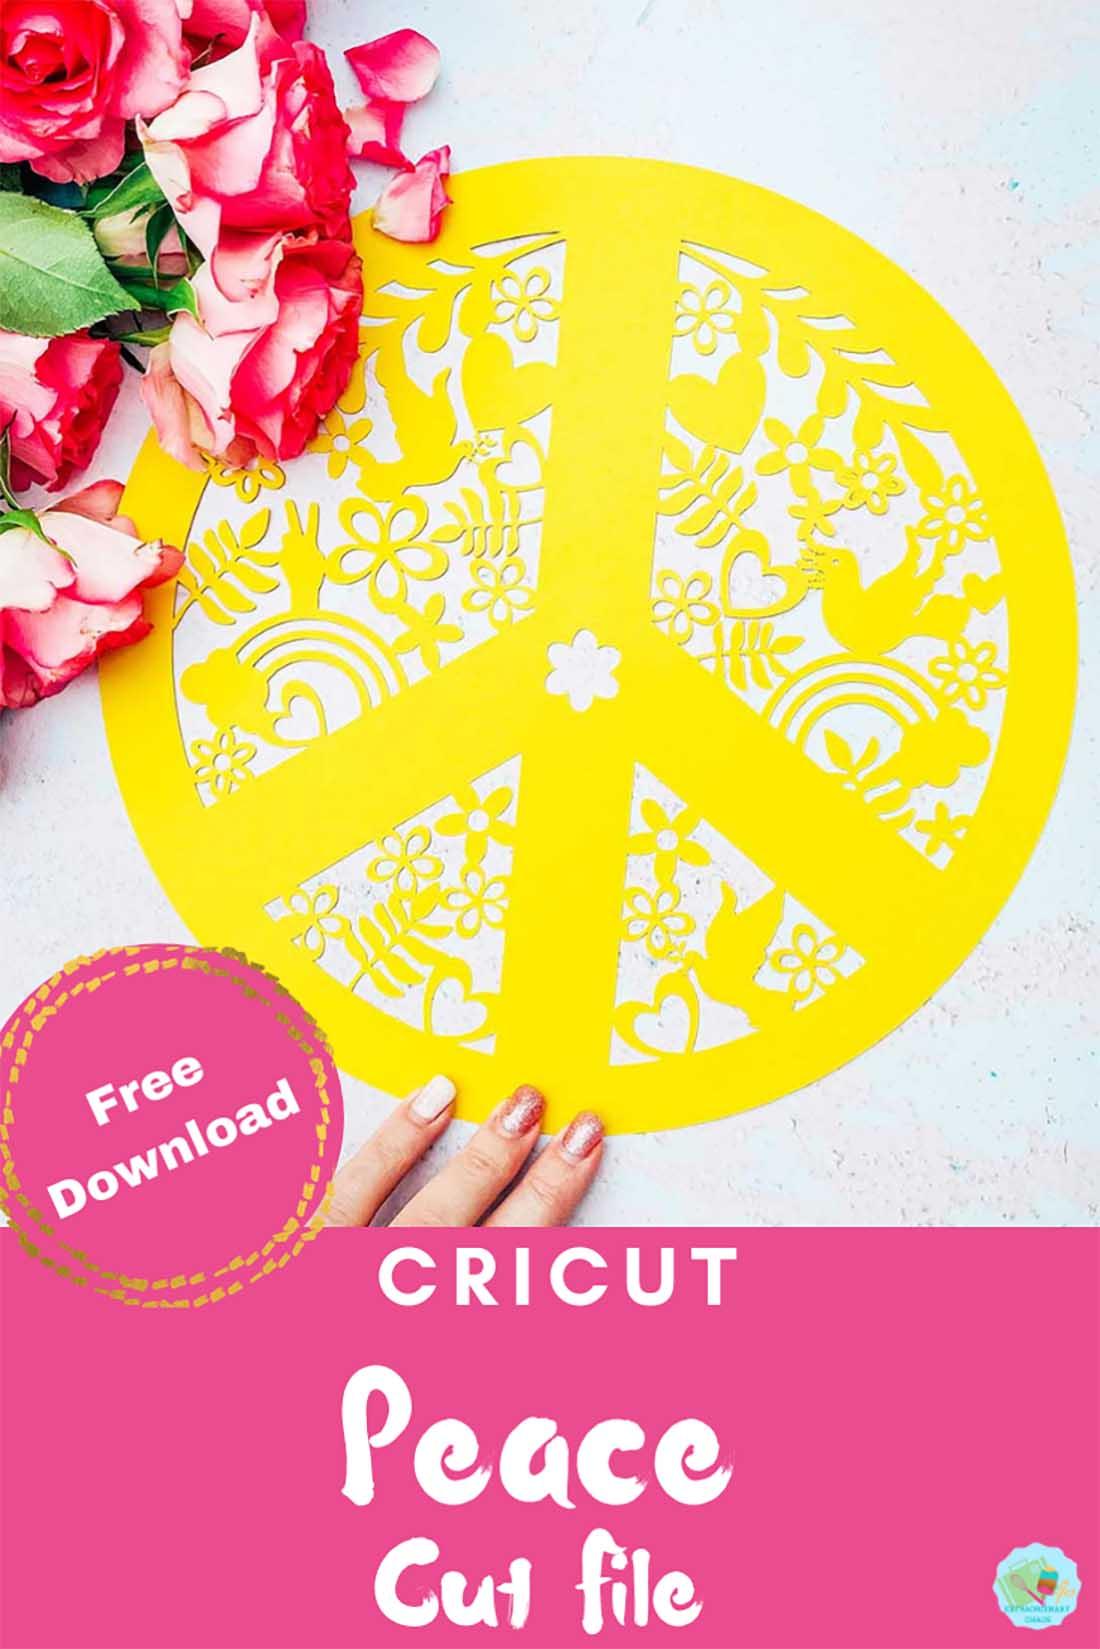 Free downloadable Cricut peace cut file